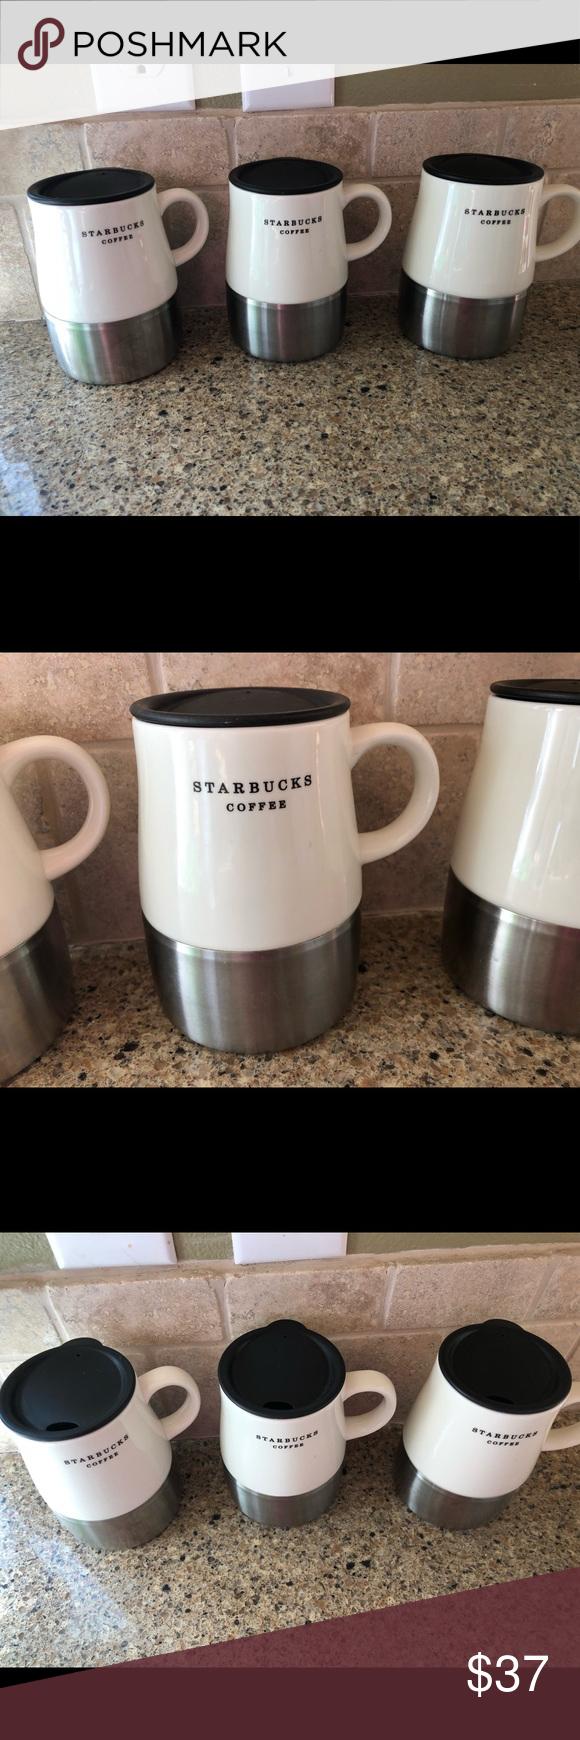 2006 Microwave Starbucks Mug Travel Stainless Steelceramic WrBdoexQC